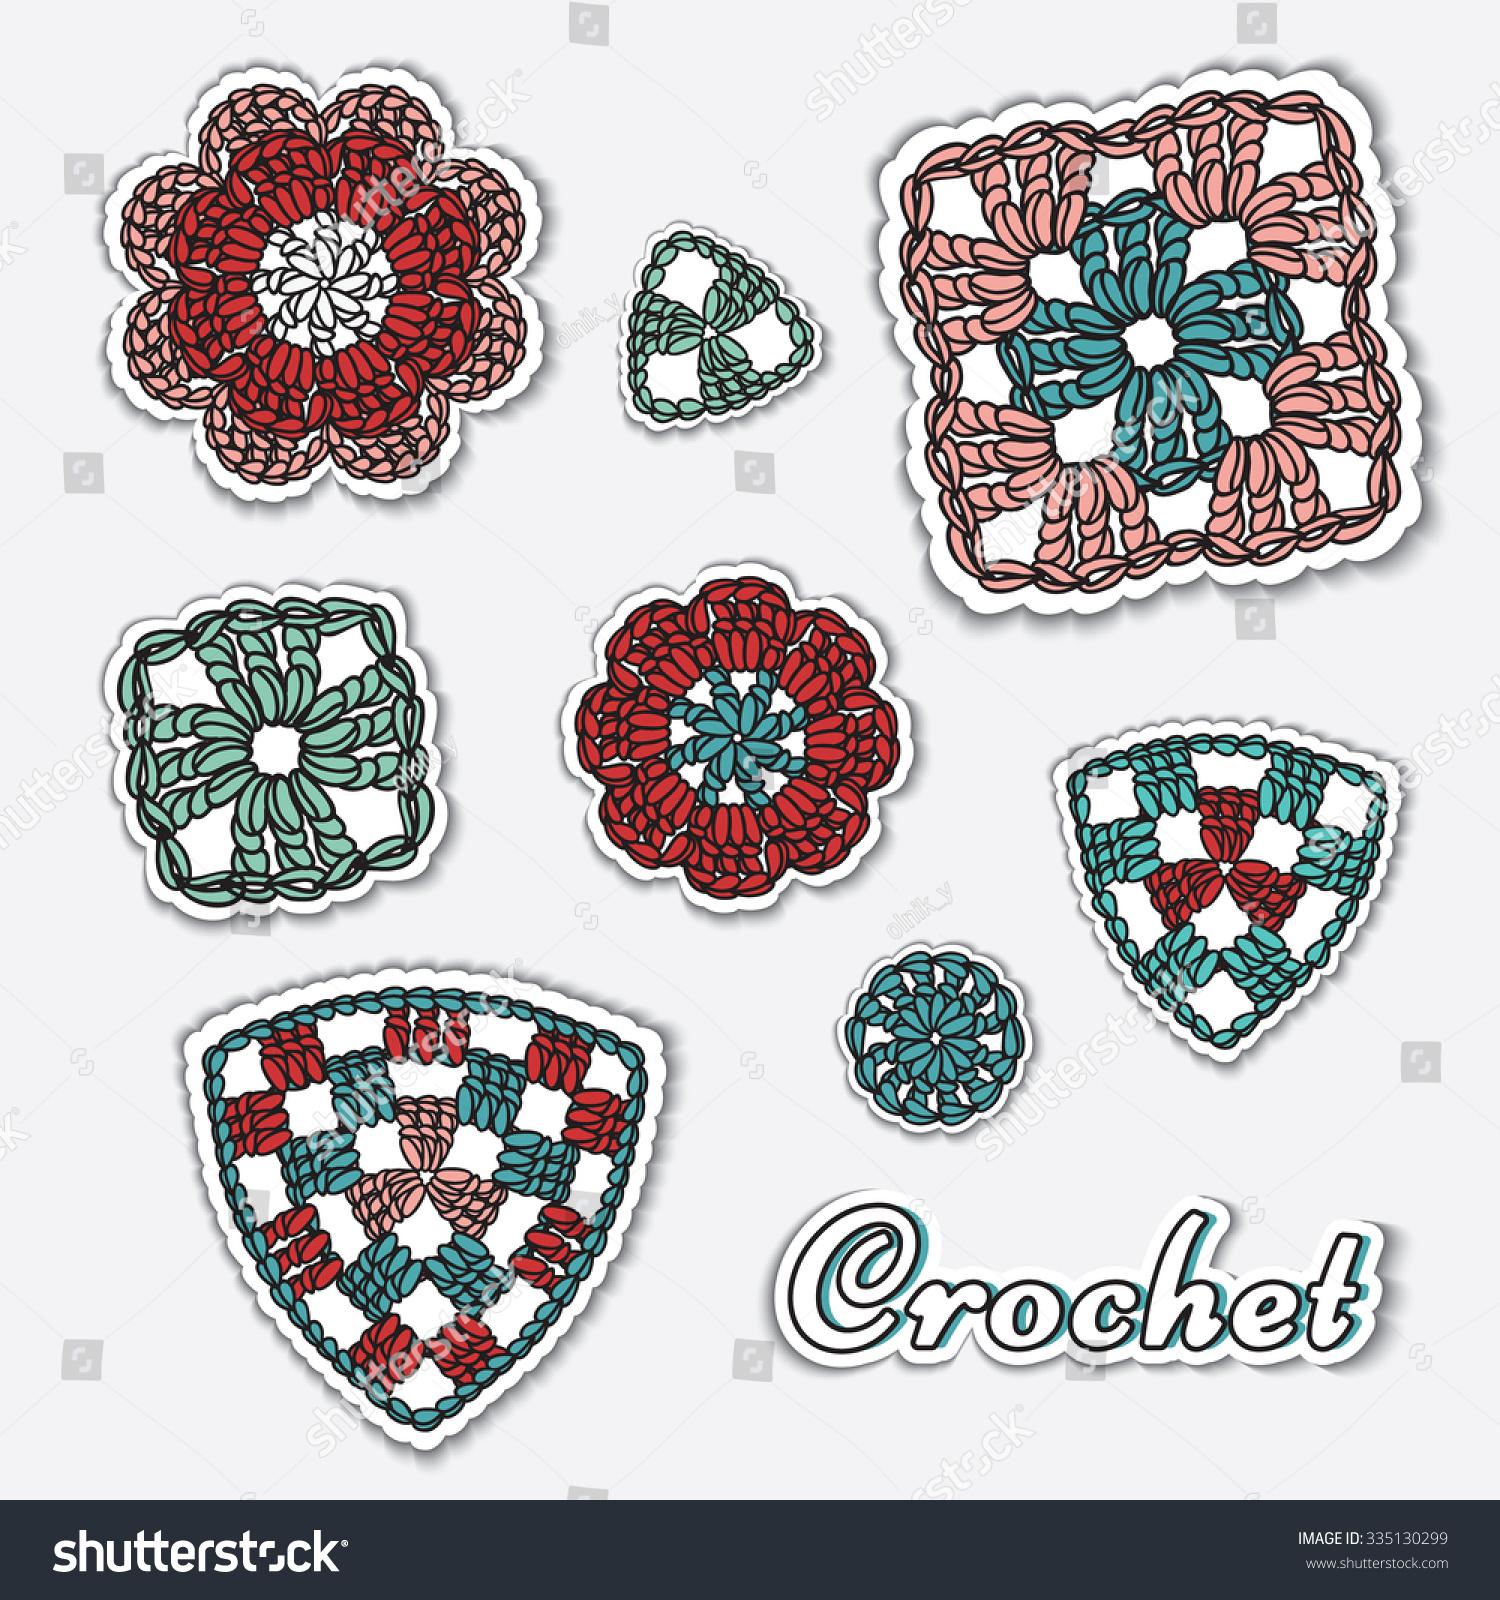 ... crochet elements. Granny square, flower, triangle. Crochet stitches